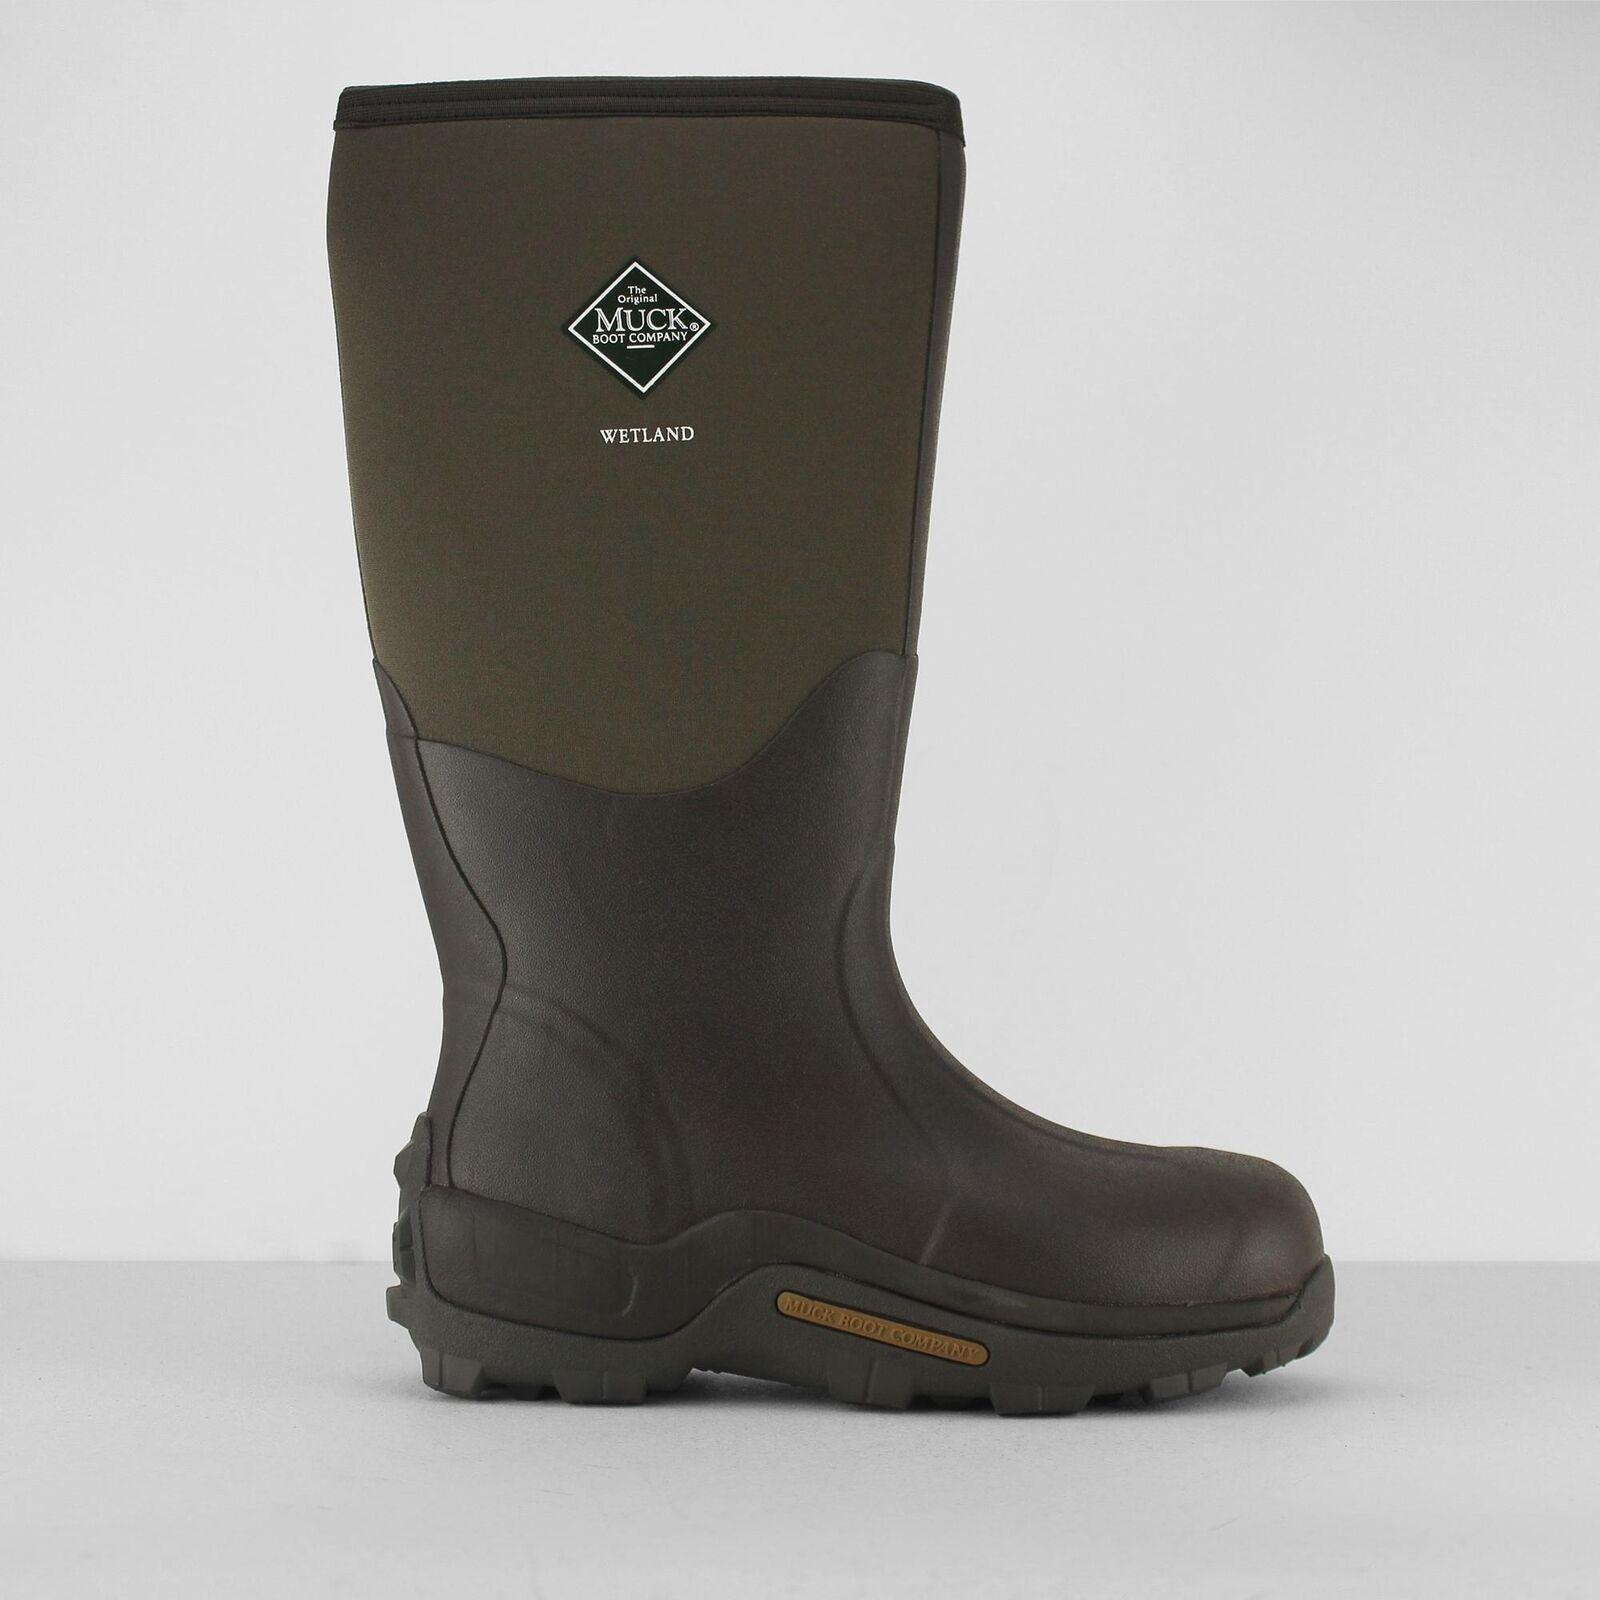 Muck ® botas humedal Unisex Para Hombre señoras Wellington impermeable botas corteza marrón